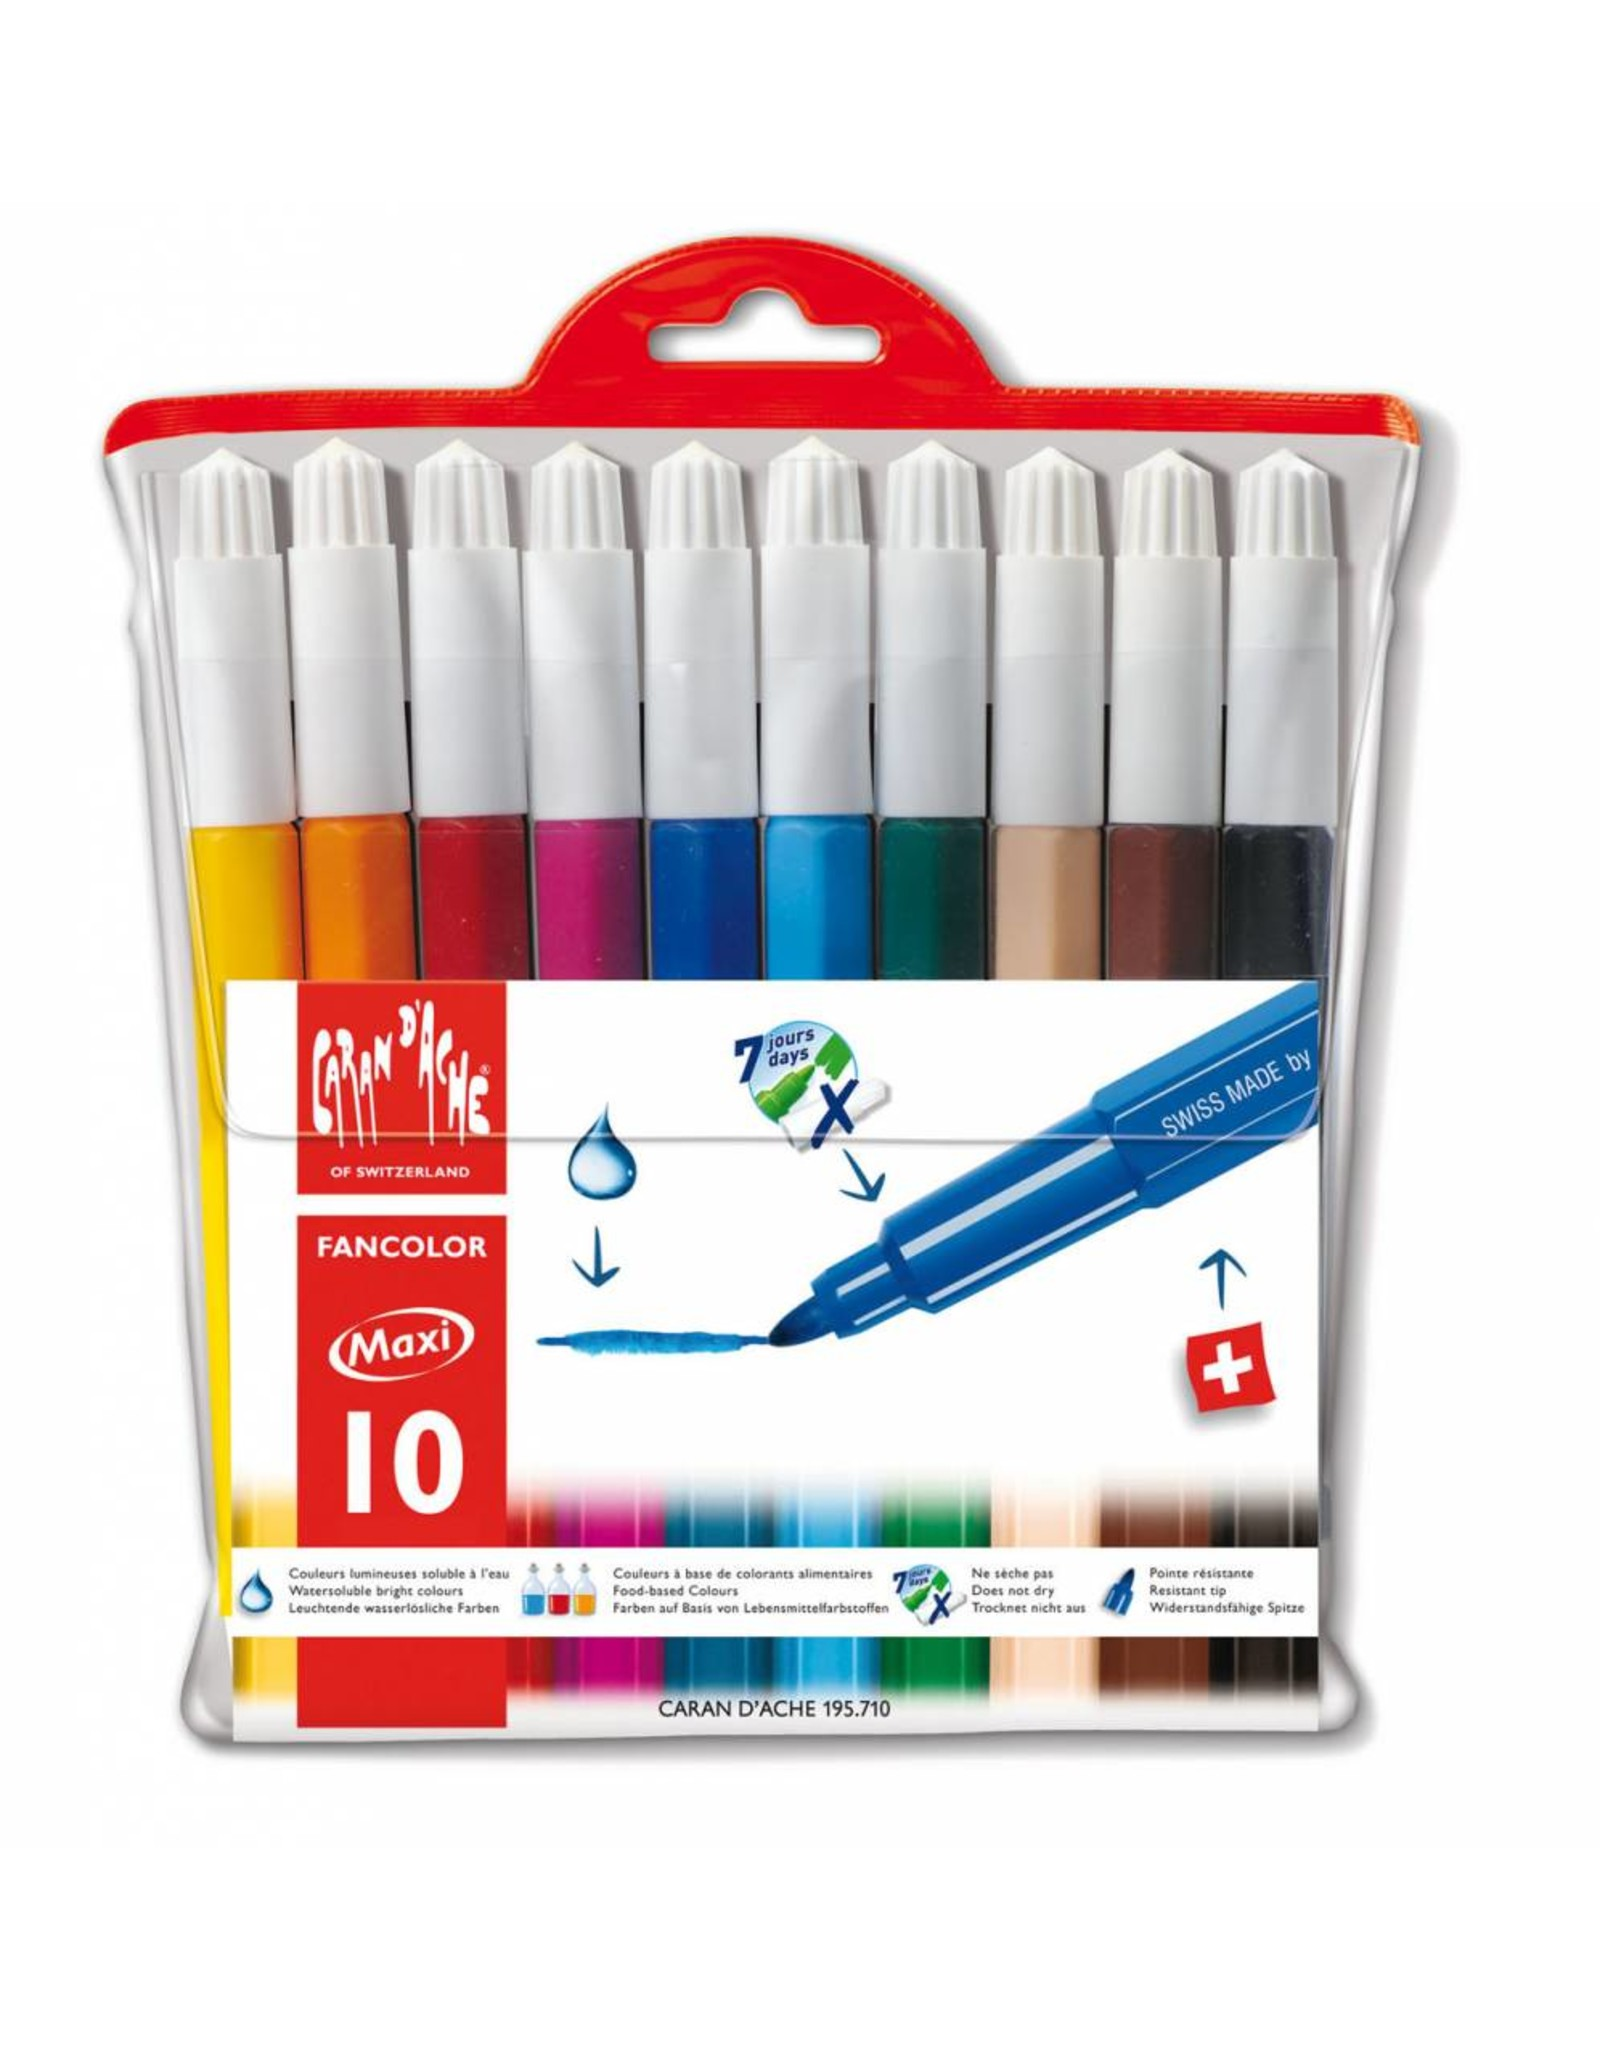 Caran d'Ache Fancolor maxi stiften 10